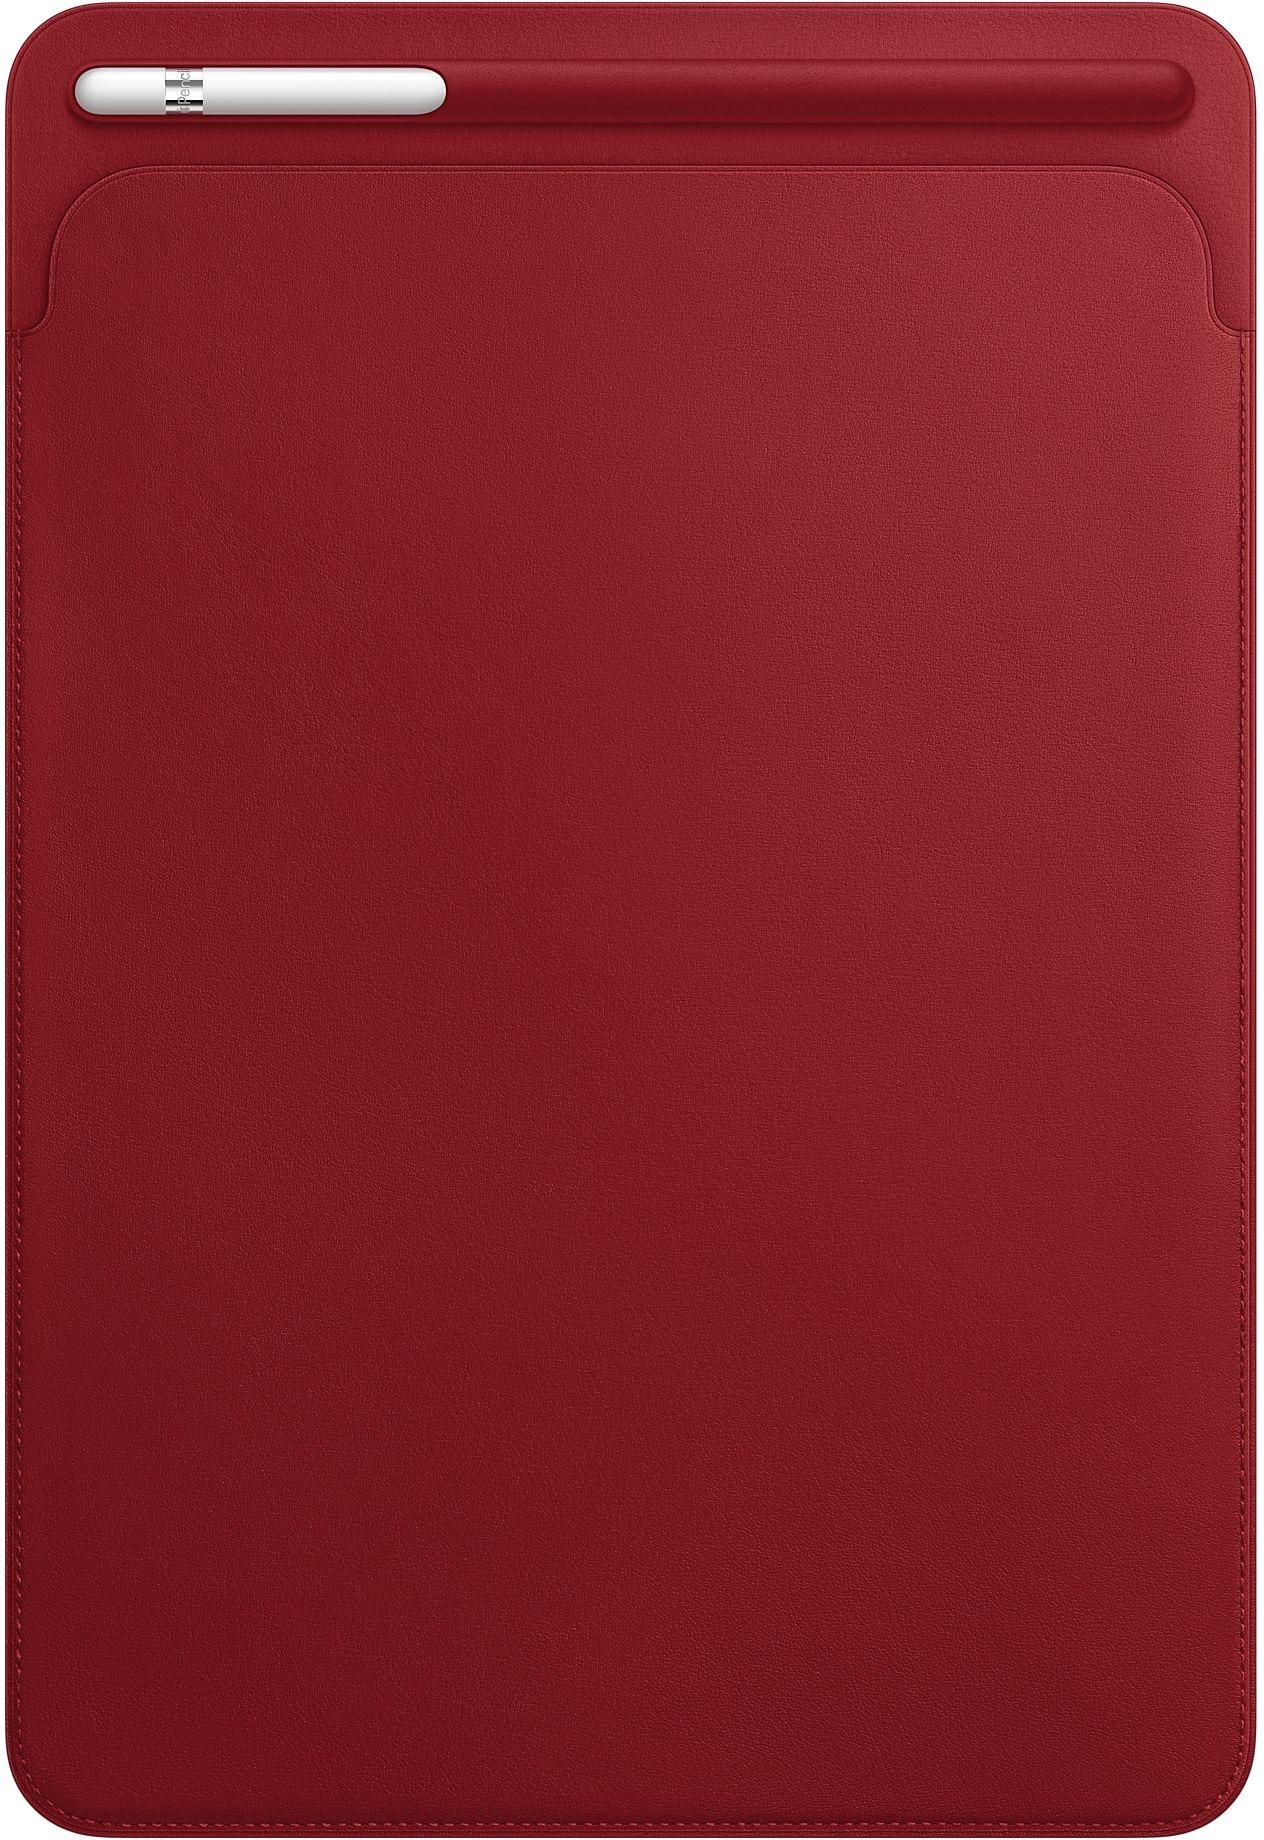 Capa de couro para iPad Pro de 10,5 pol. - (PRODUCT)RED